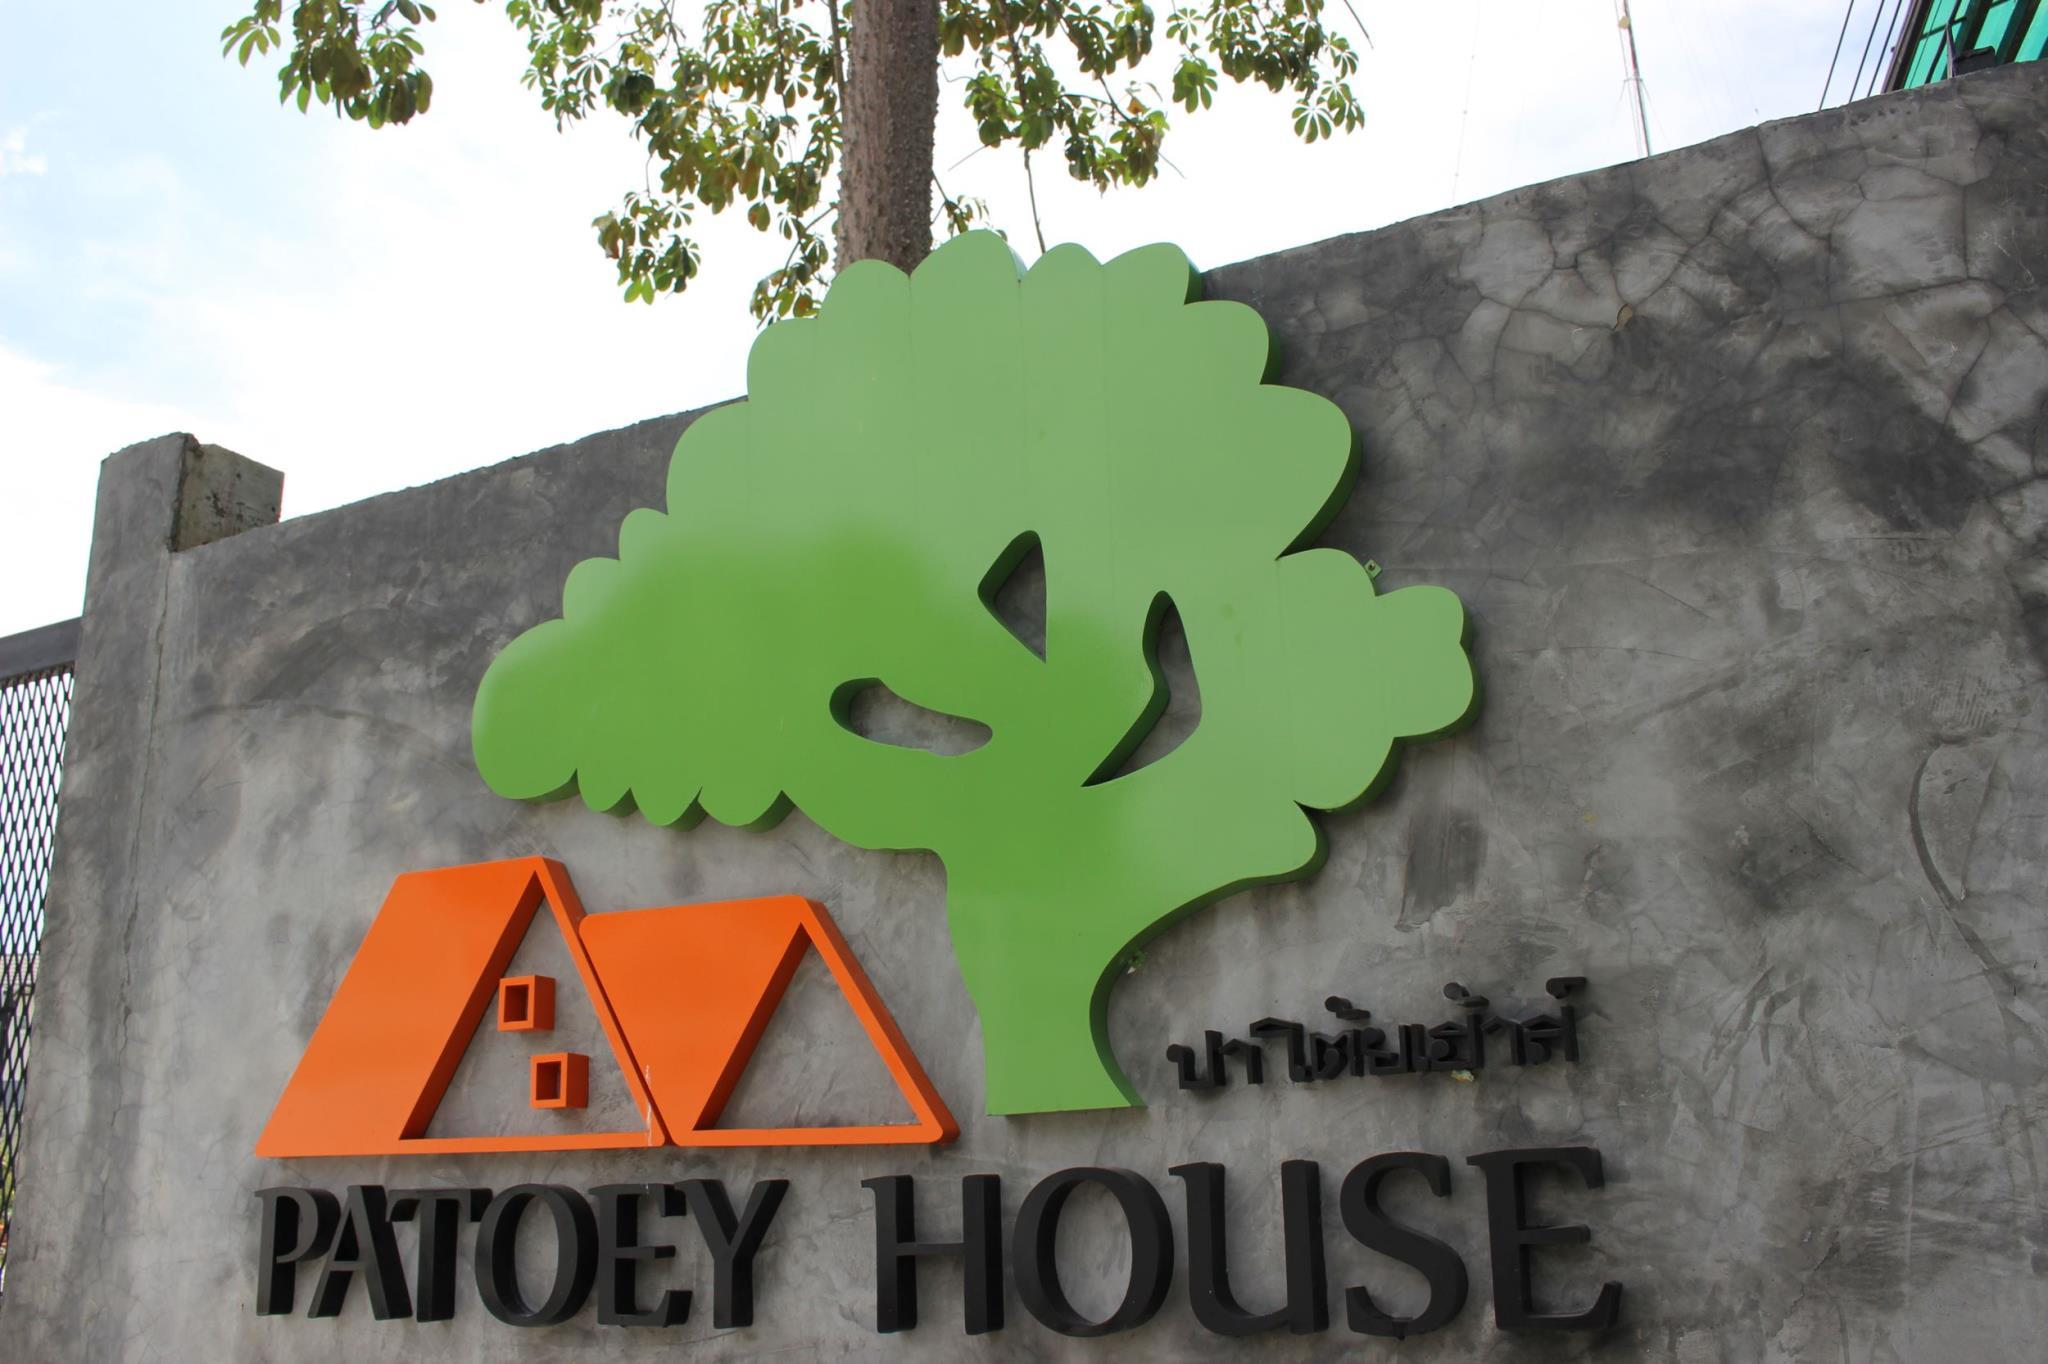 Patoey House